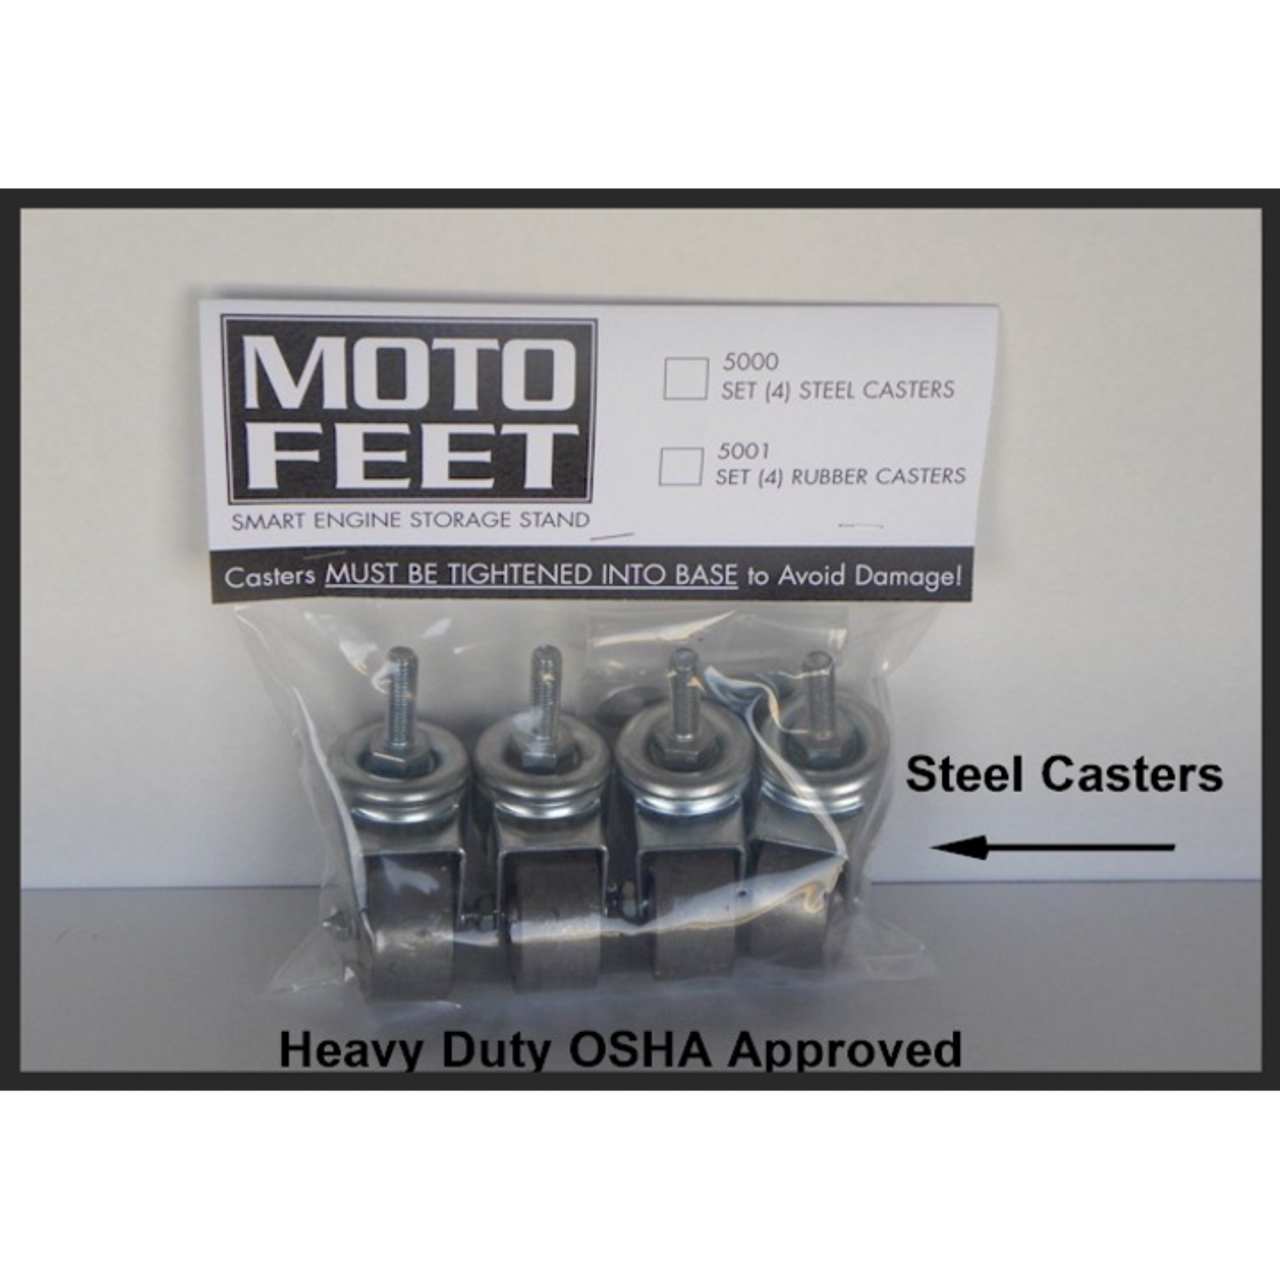 MOTOFEET Engine Stand Steel Casters